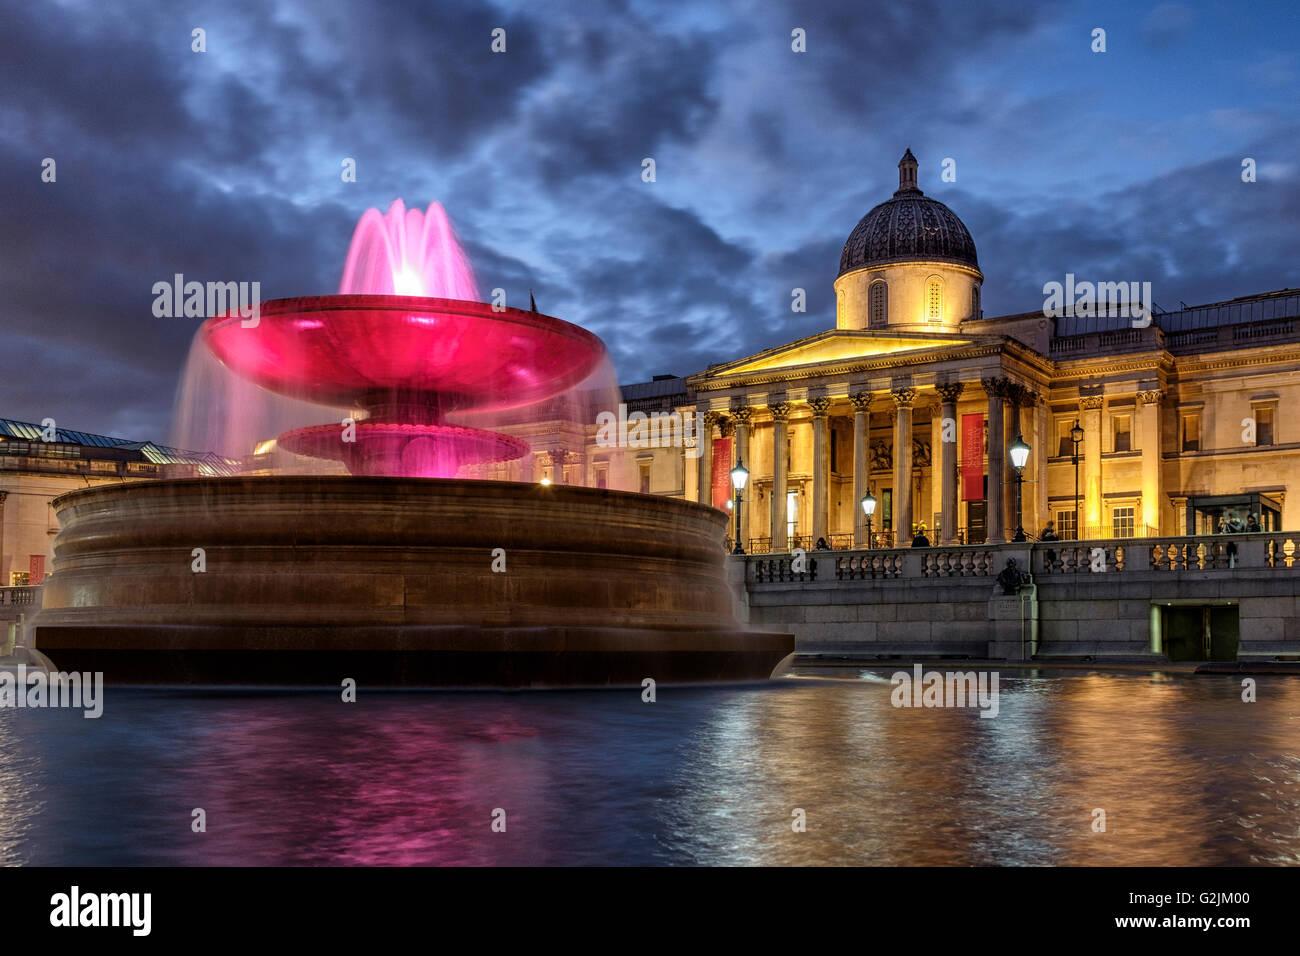 Fontana illuminata e il National Galleryat notte,Trafalgar Square,Londra,Inghilterra Foto Stock